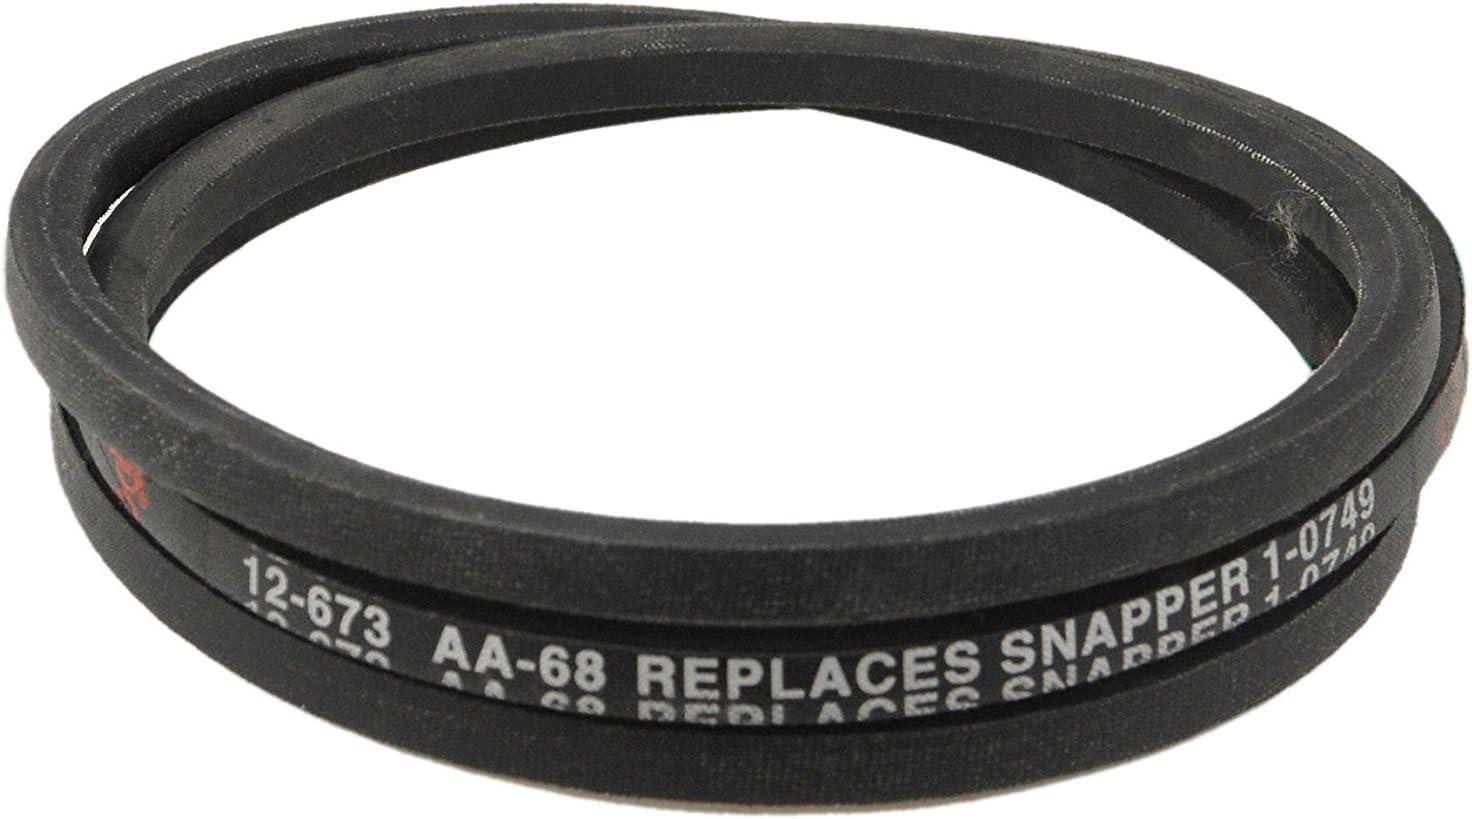 SNAPPER 1-0629 Replacement Belt 1//2x98